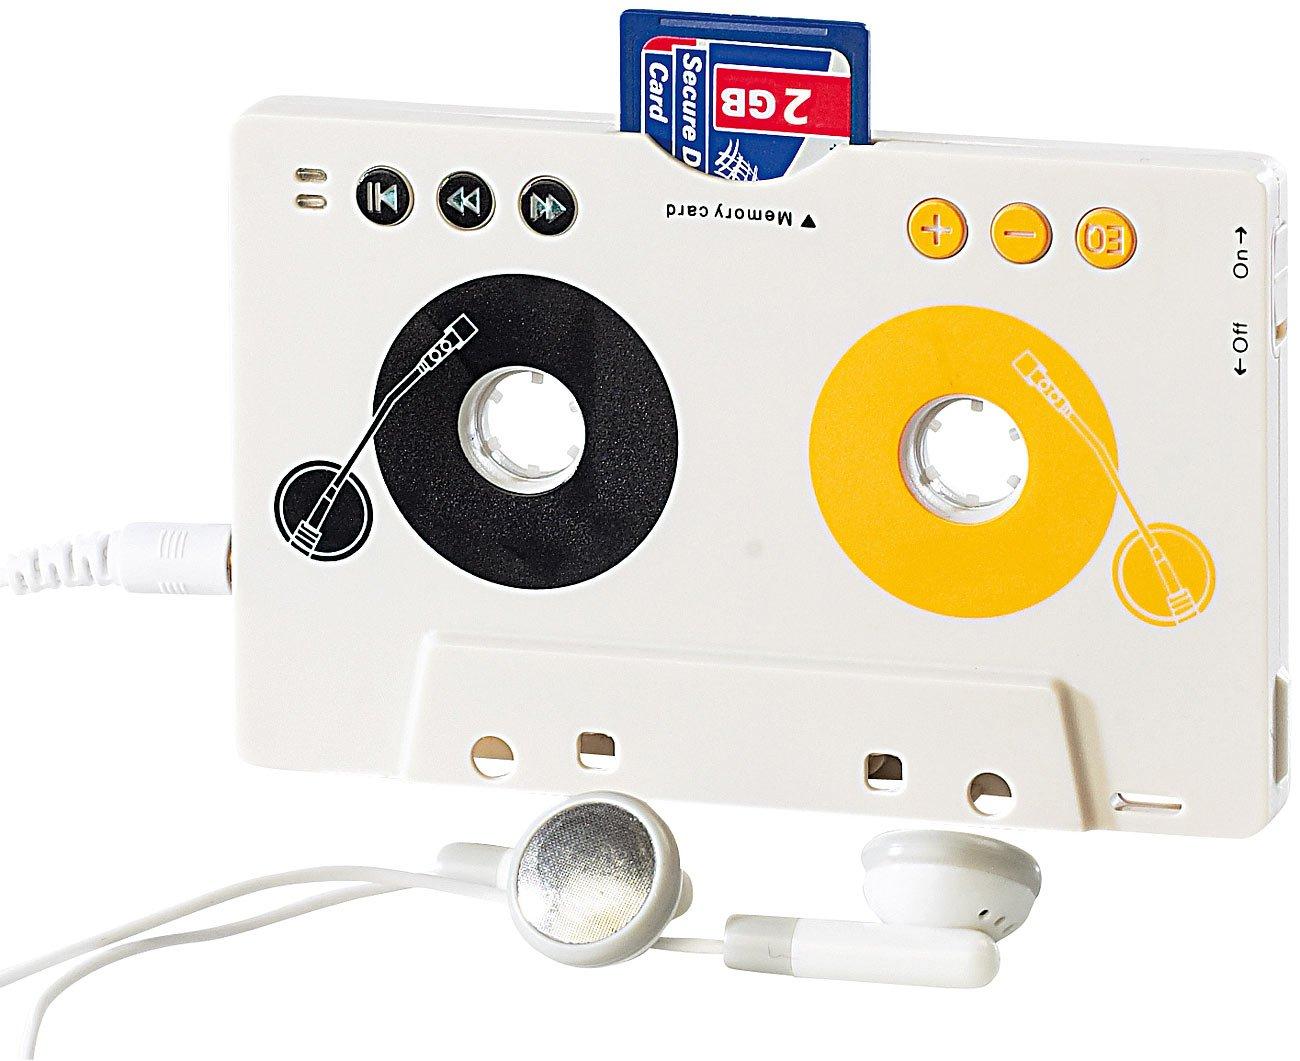 auvisio Kassetten Adapter USB: MP3-Player fü r Kassettenautoradio, Kassettenadapter mit Fernbedienung (MP3 Kassette) PX-2706